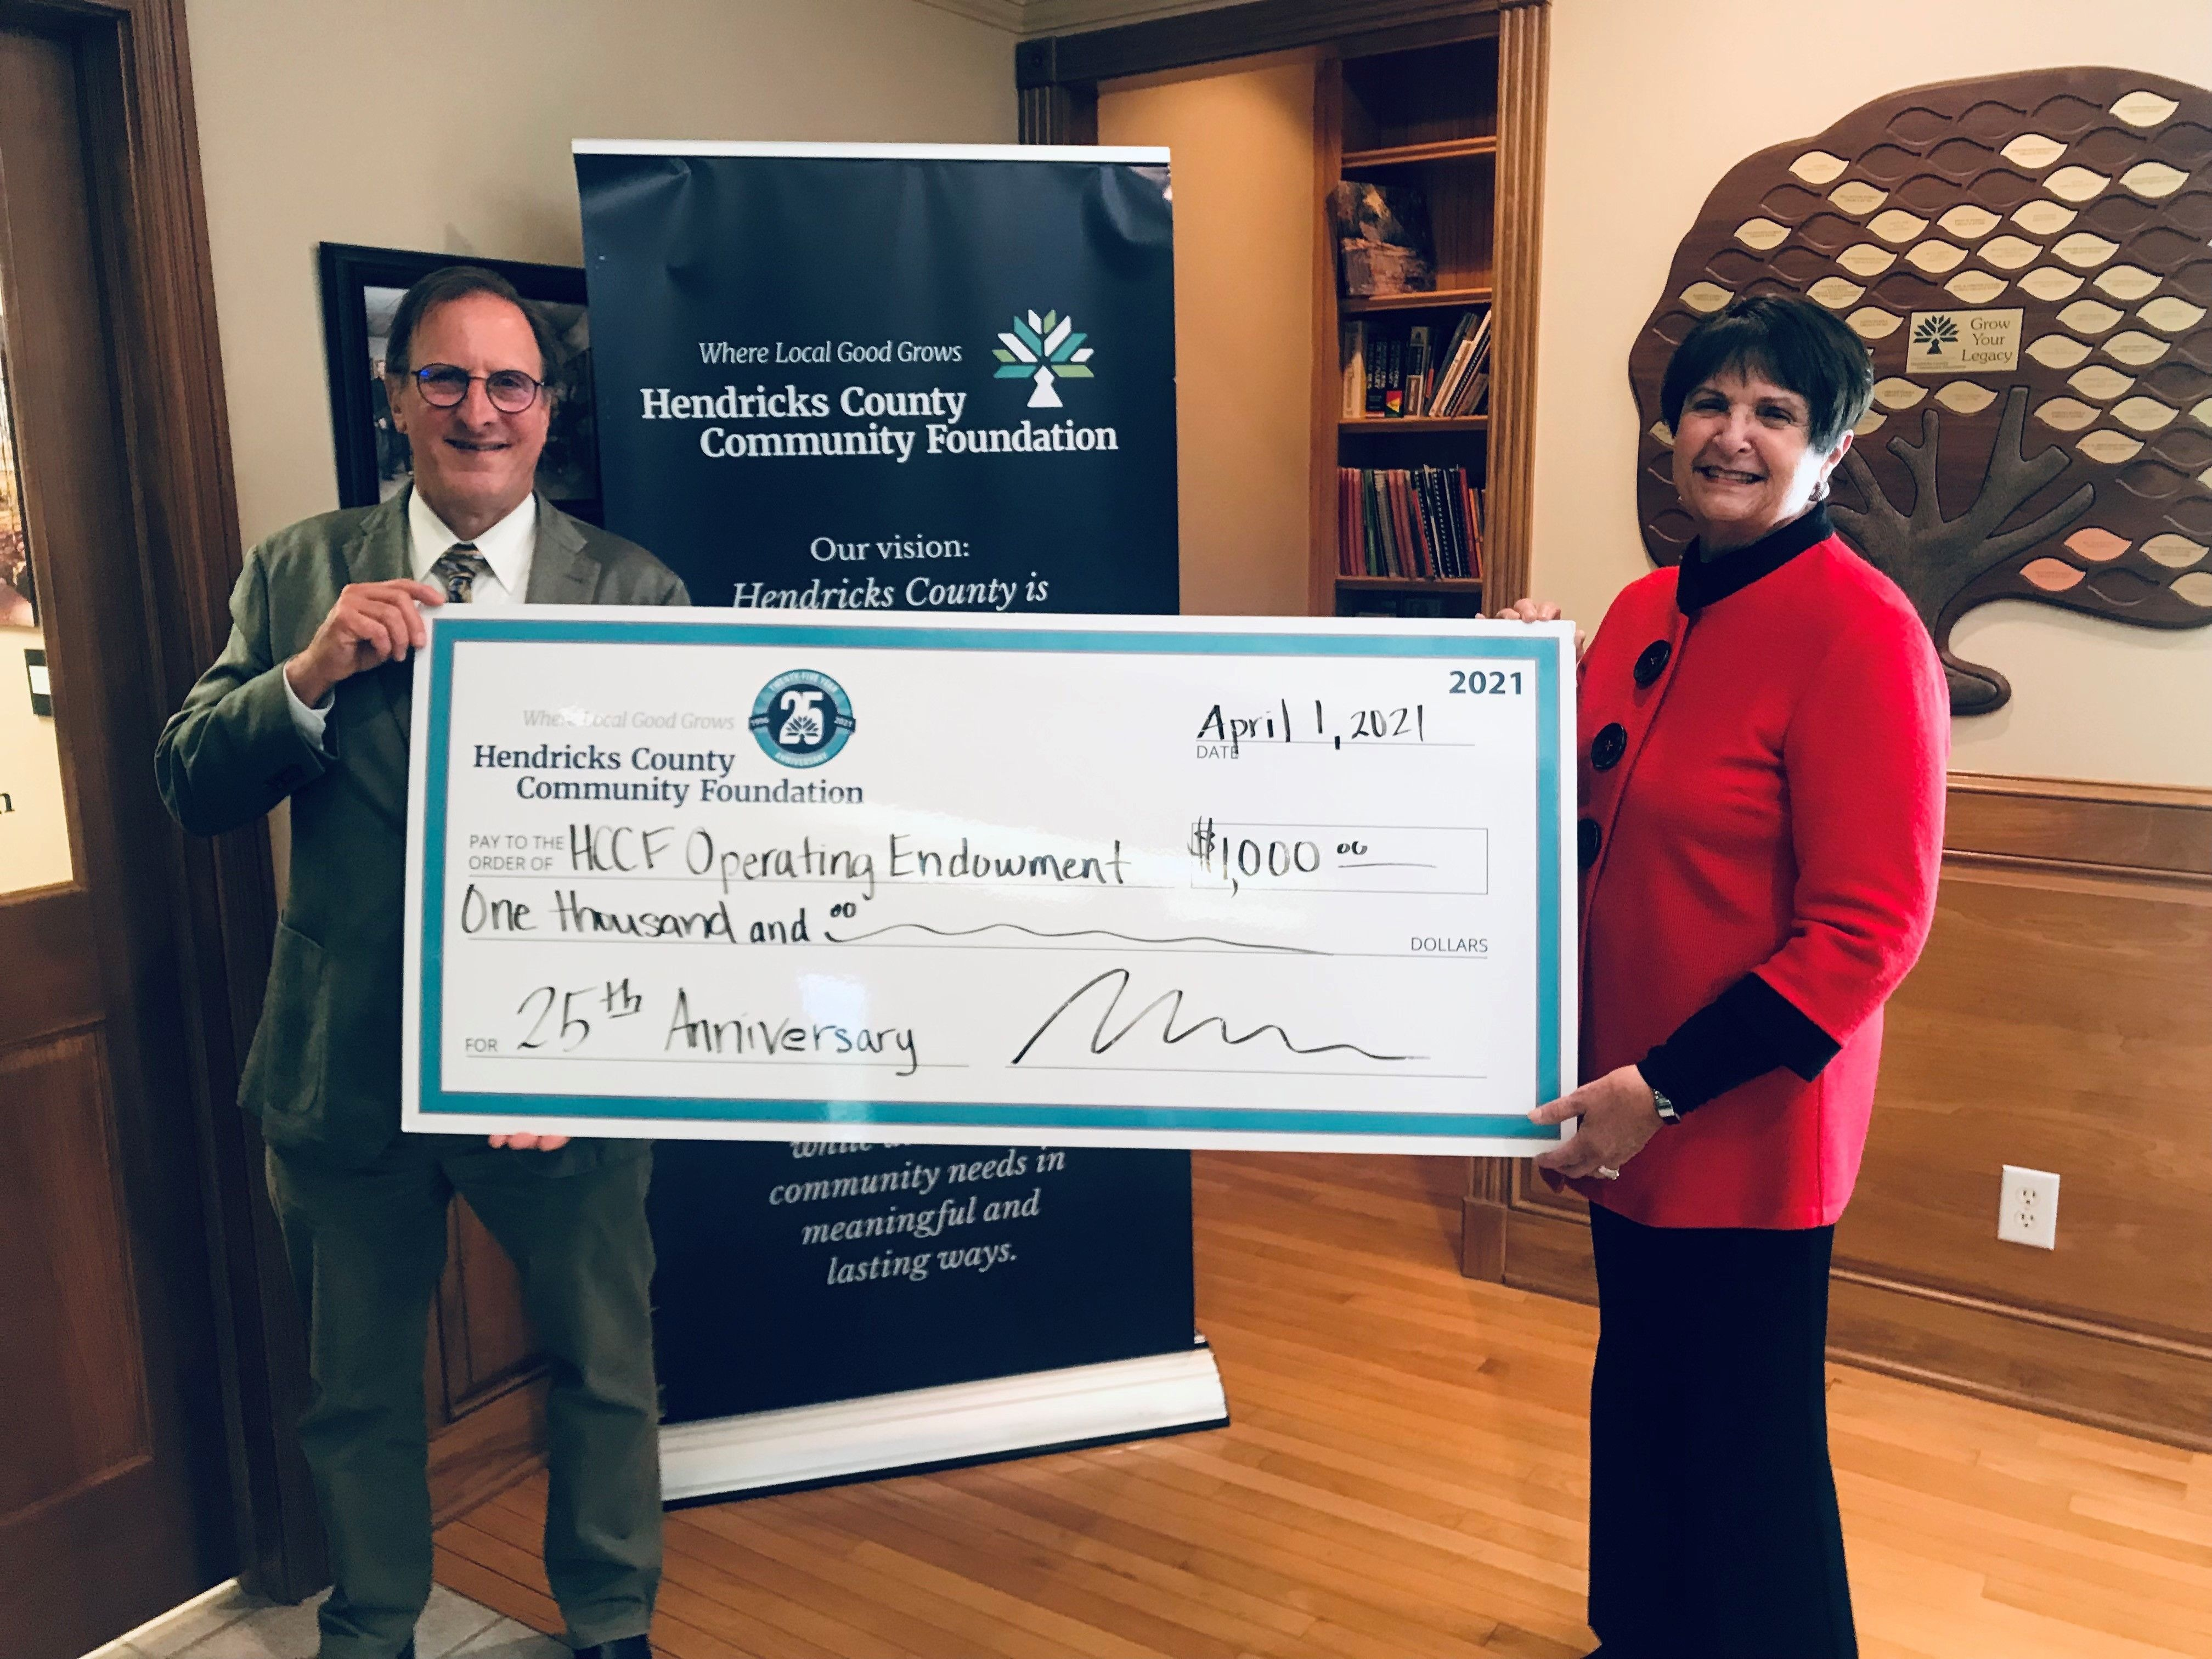 HCCF Operating Endowment Fund